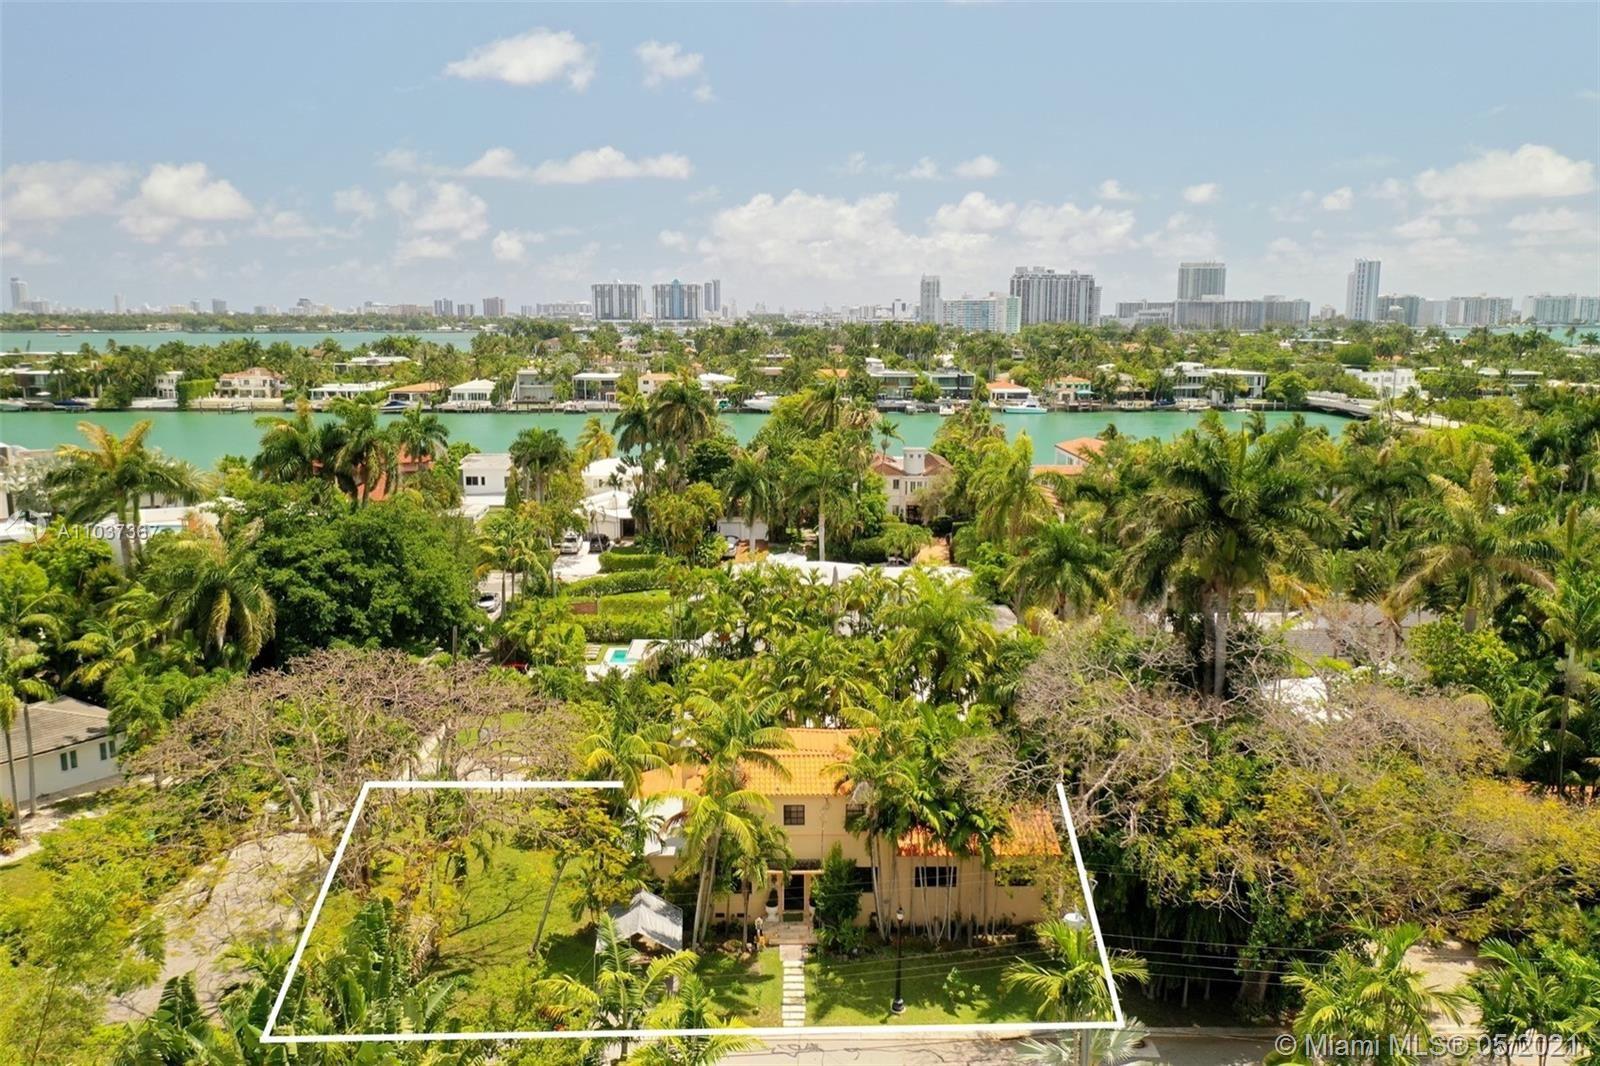 Photo of 315 W San Marino Dr, Miami Beach, FL 33139 (MLS # A11037367)